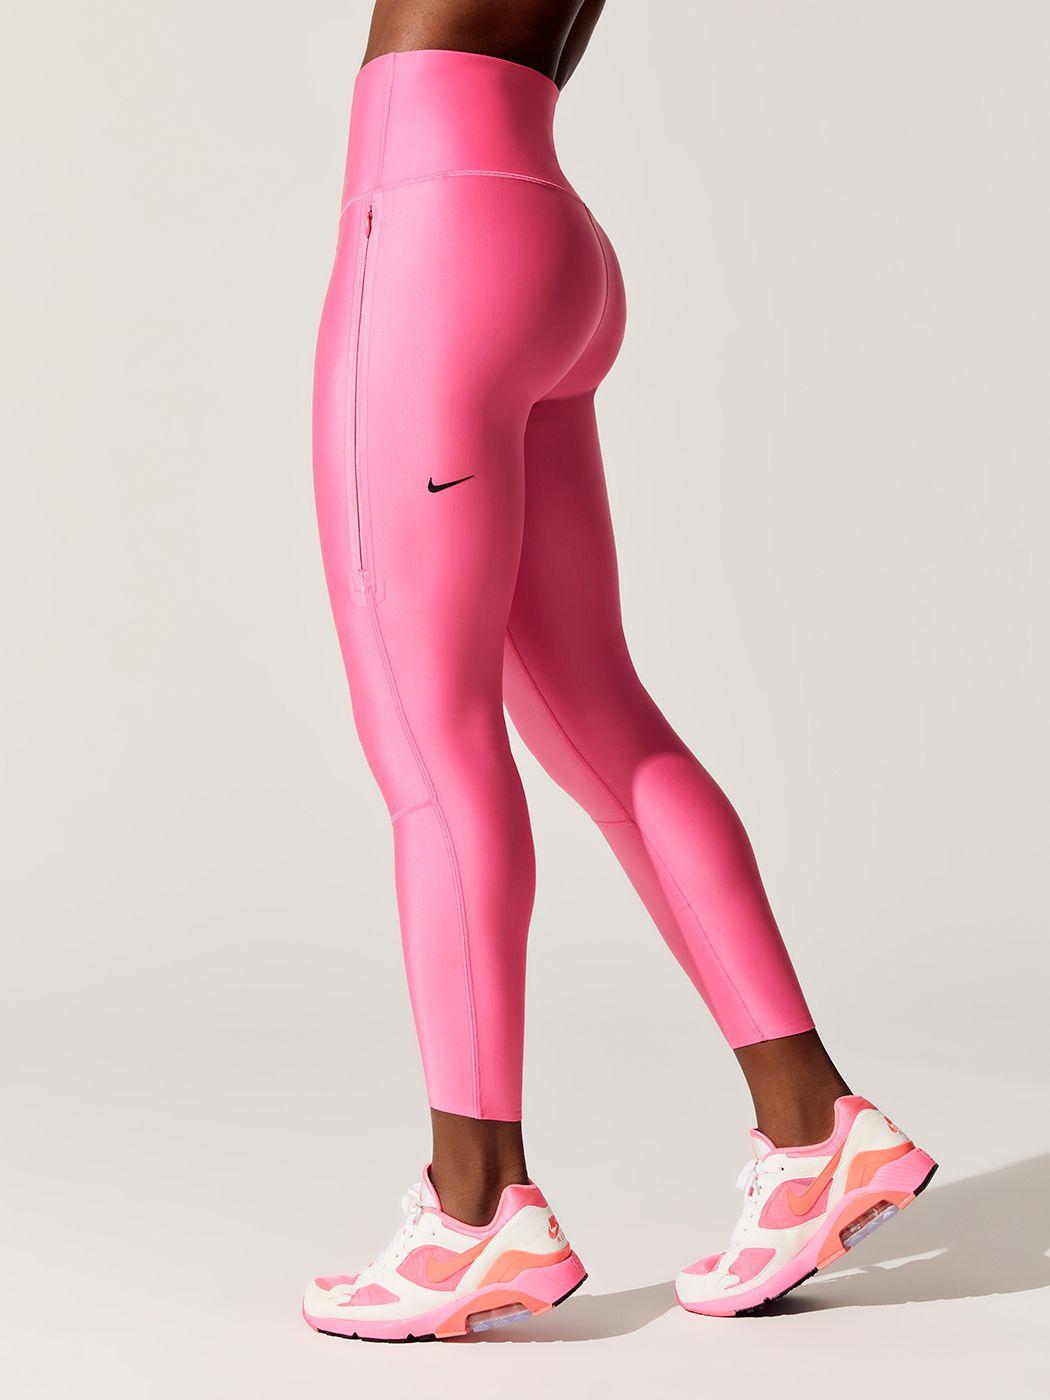 Women's Training Tights Leggings in Neon Pink Women's